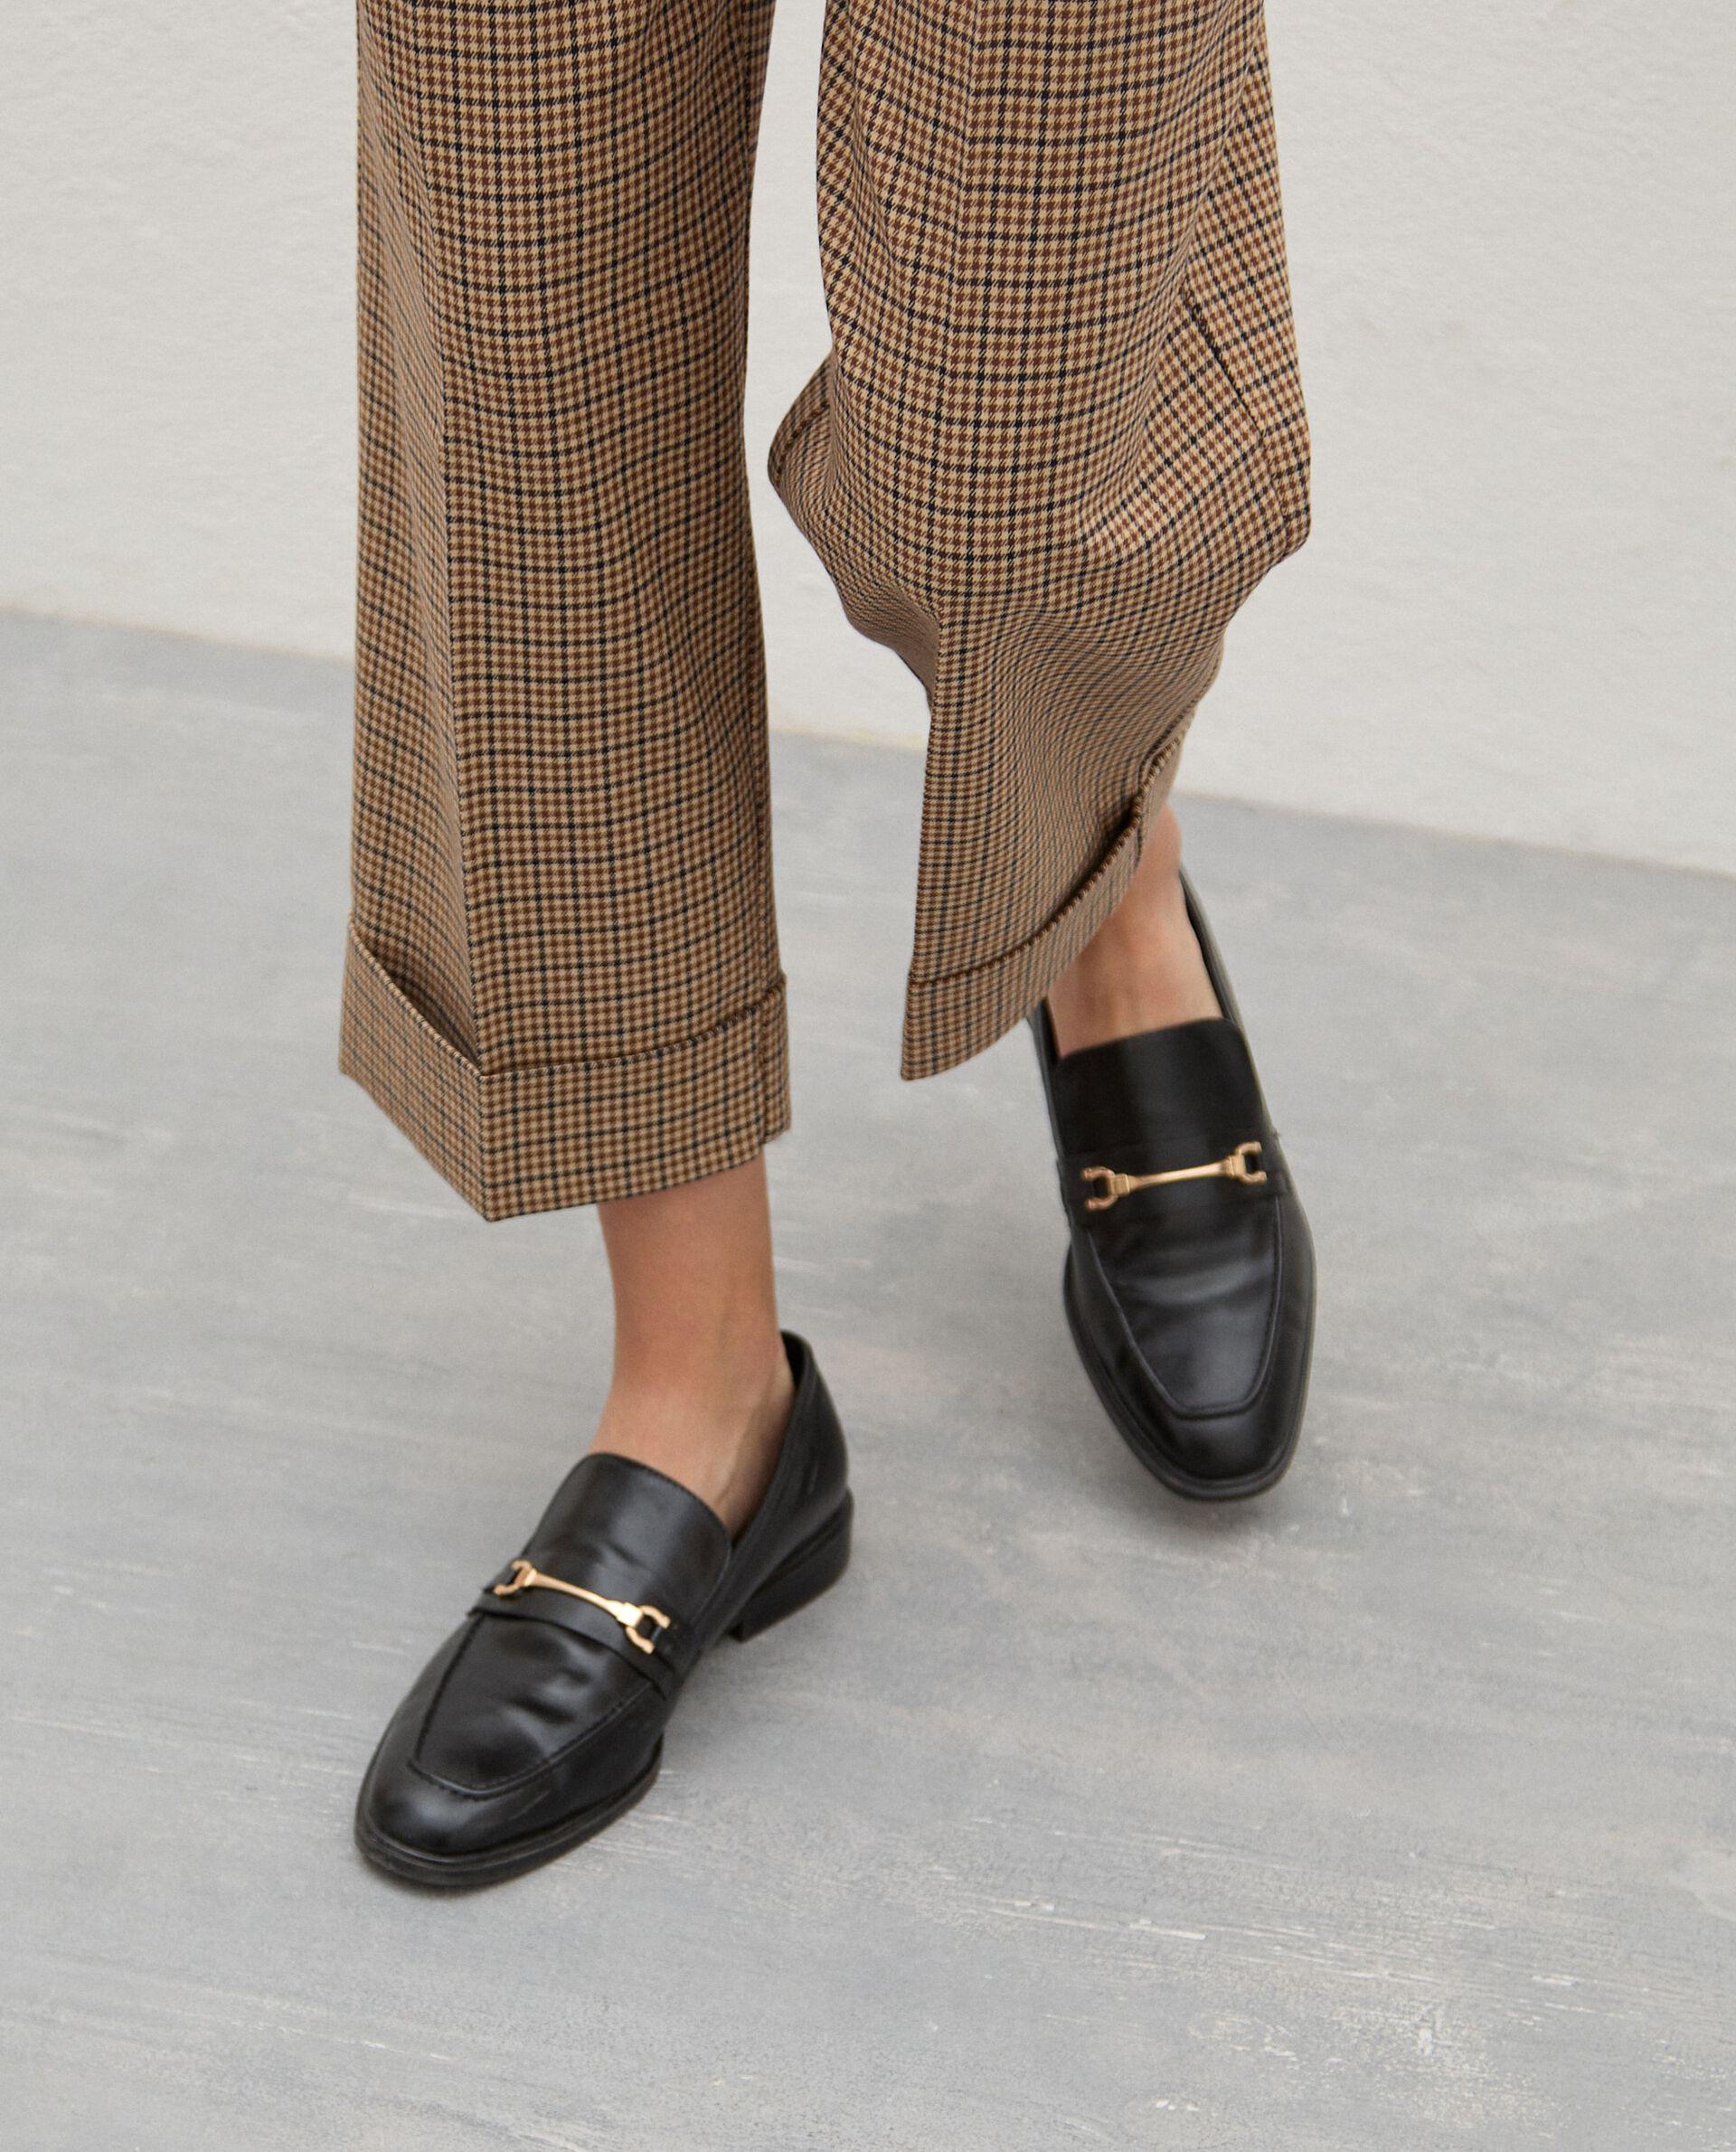 Pantaloni principe di galles ampi donna